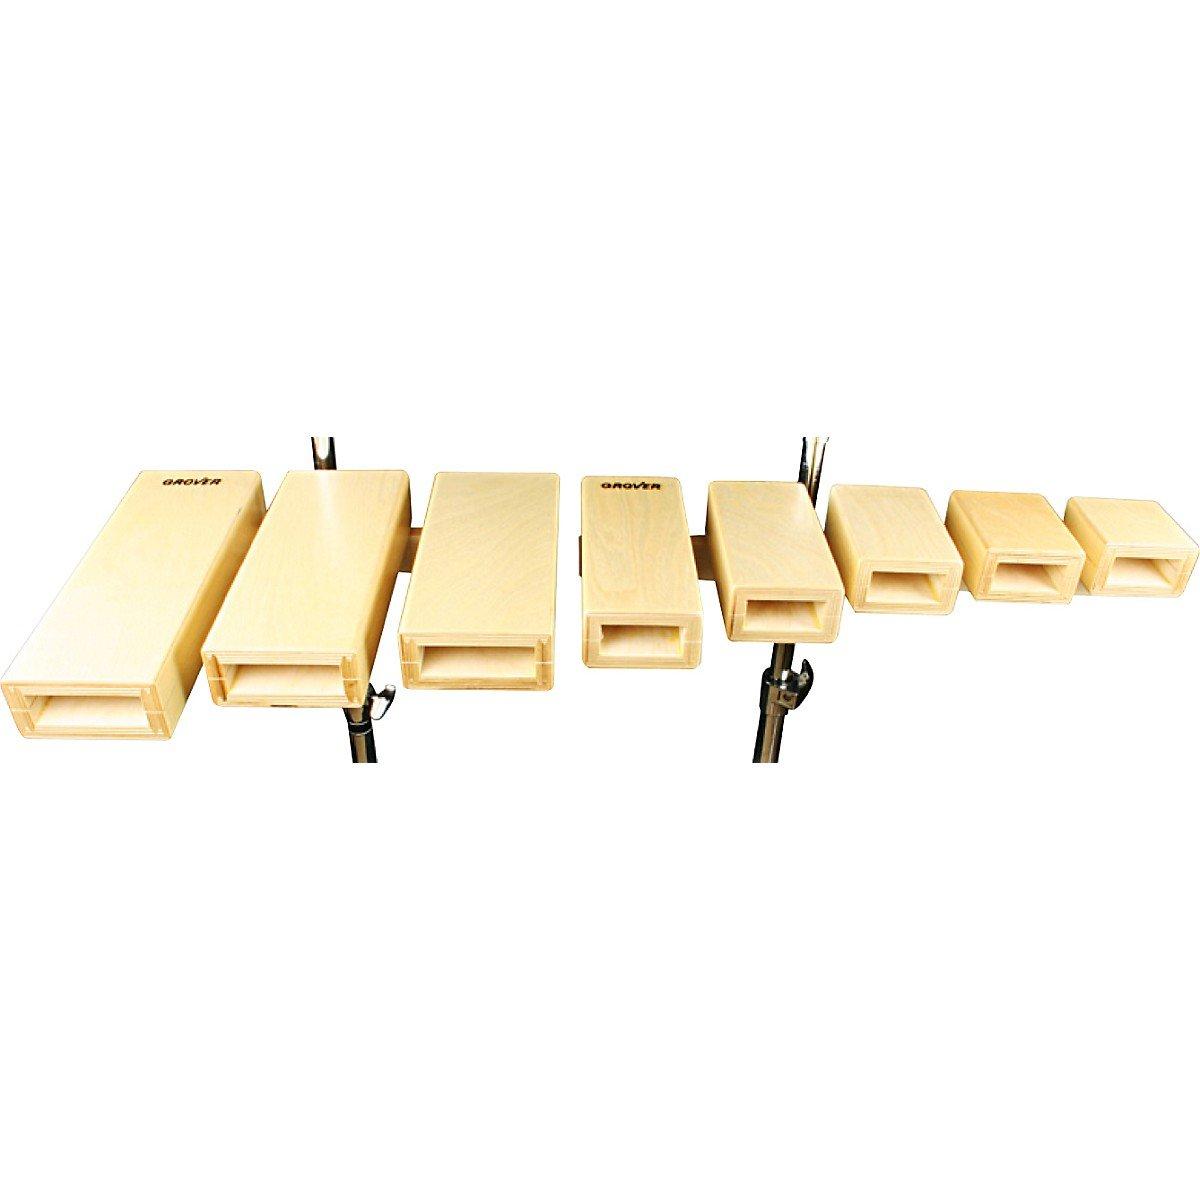 Spectra Sound Open Tone Temple Blocks Set of 5